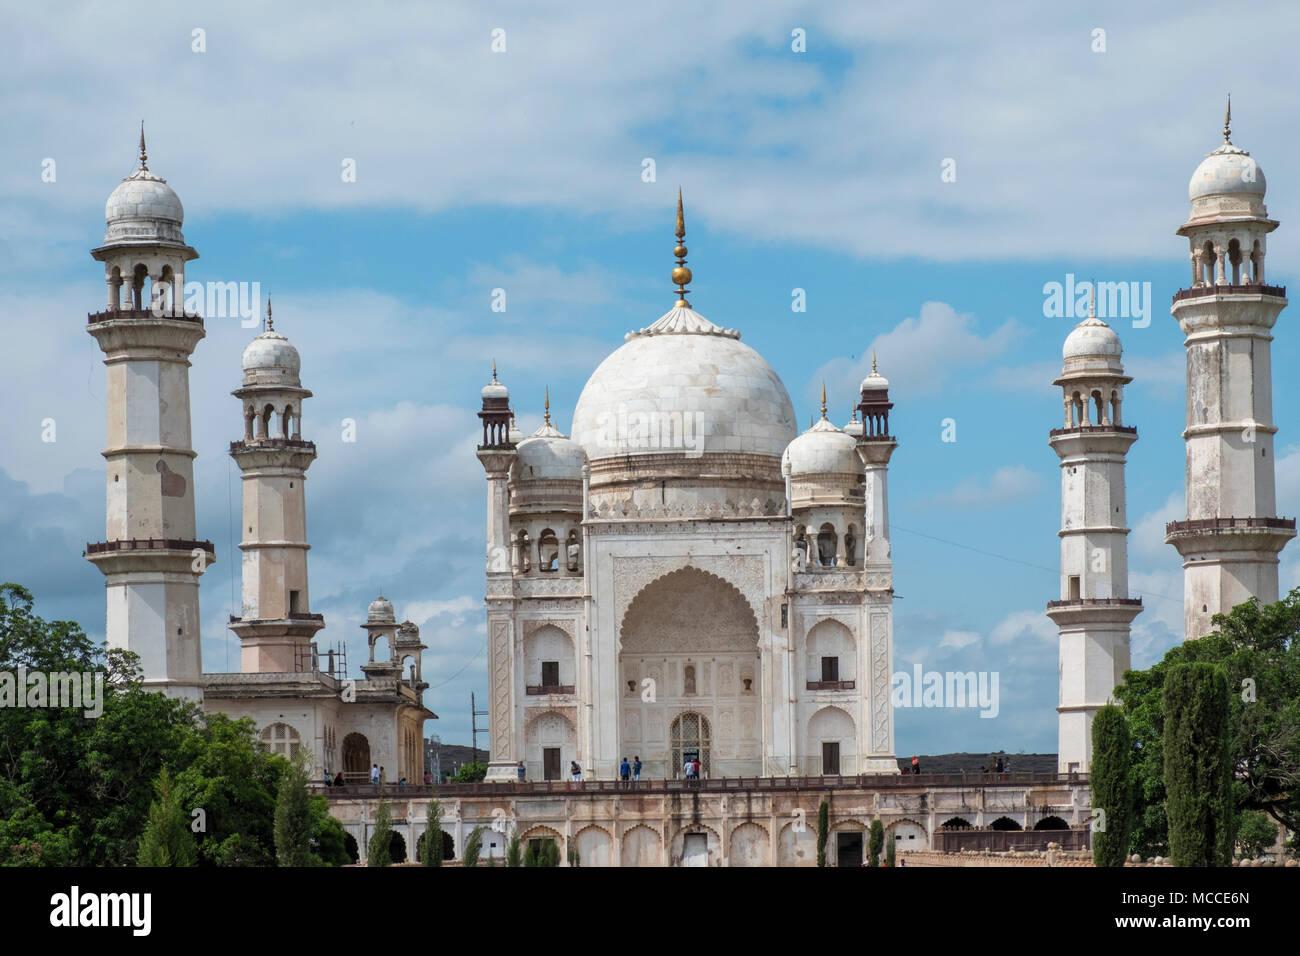 The Bibi Ka Maqbara Mughal mausoleum built by the Mughal Emperor Aurangzeb, in Aurangabad, Maharashtra - Stock Image